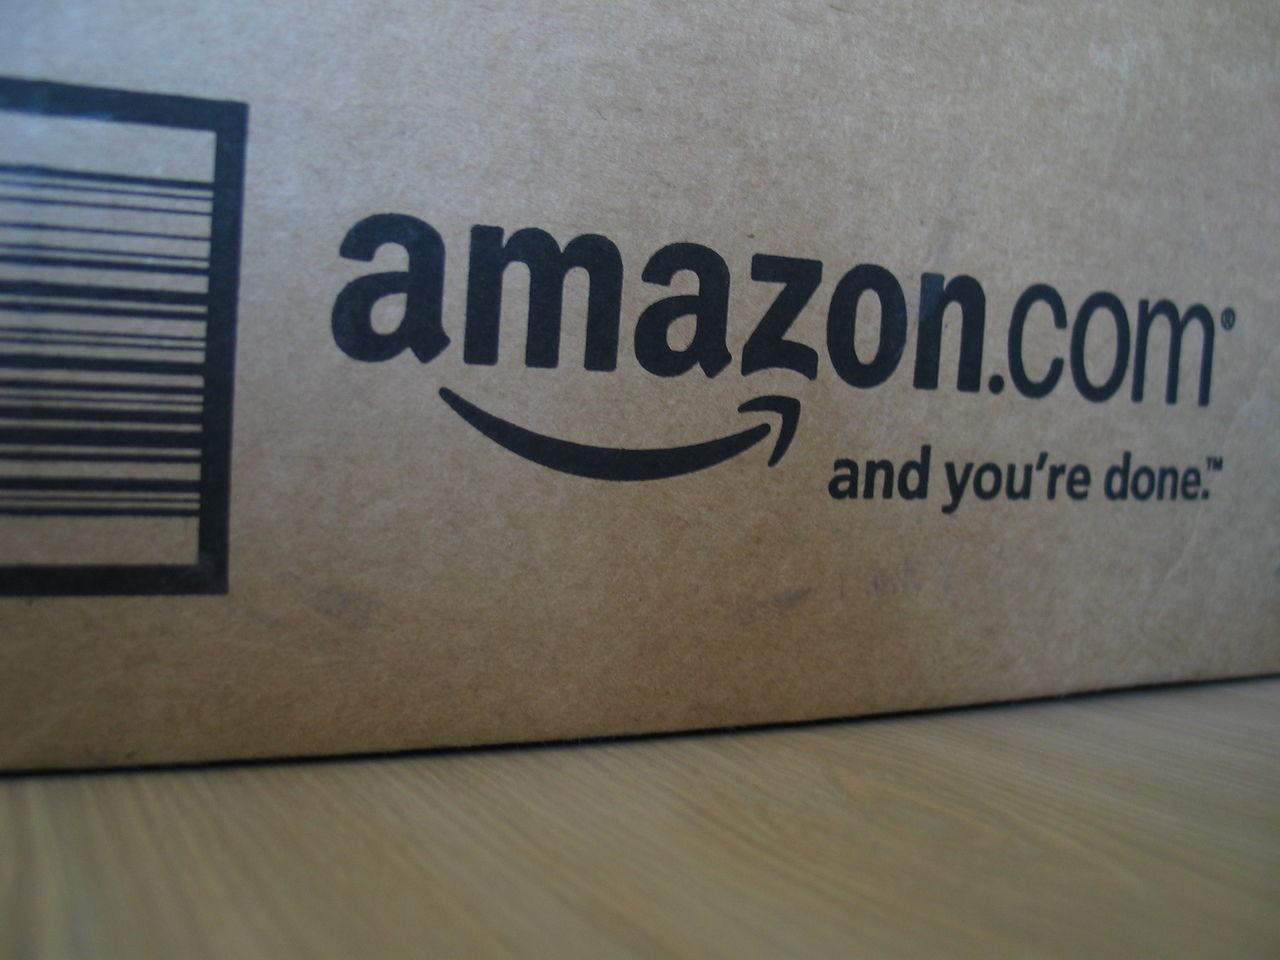 Amazon.com har nu över en miljon anställda